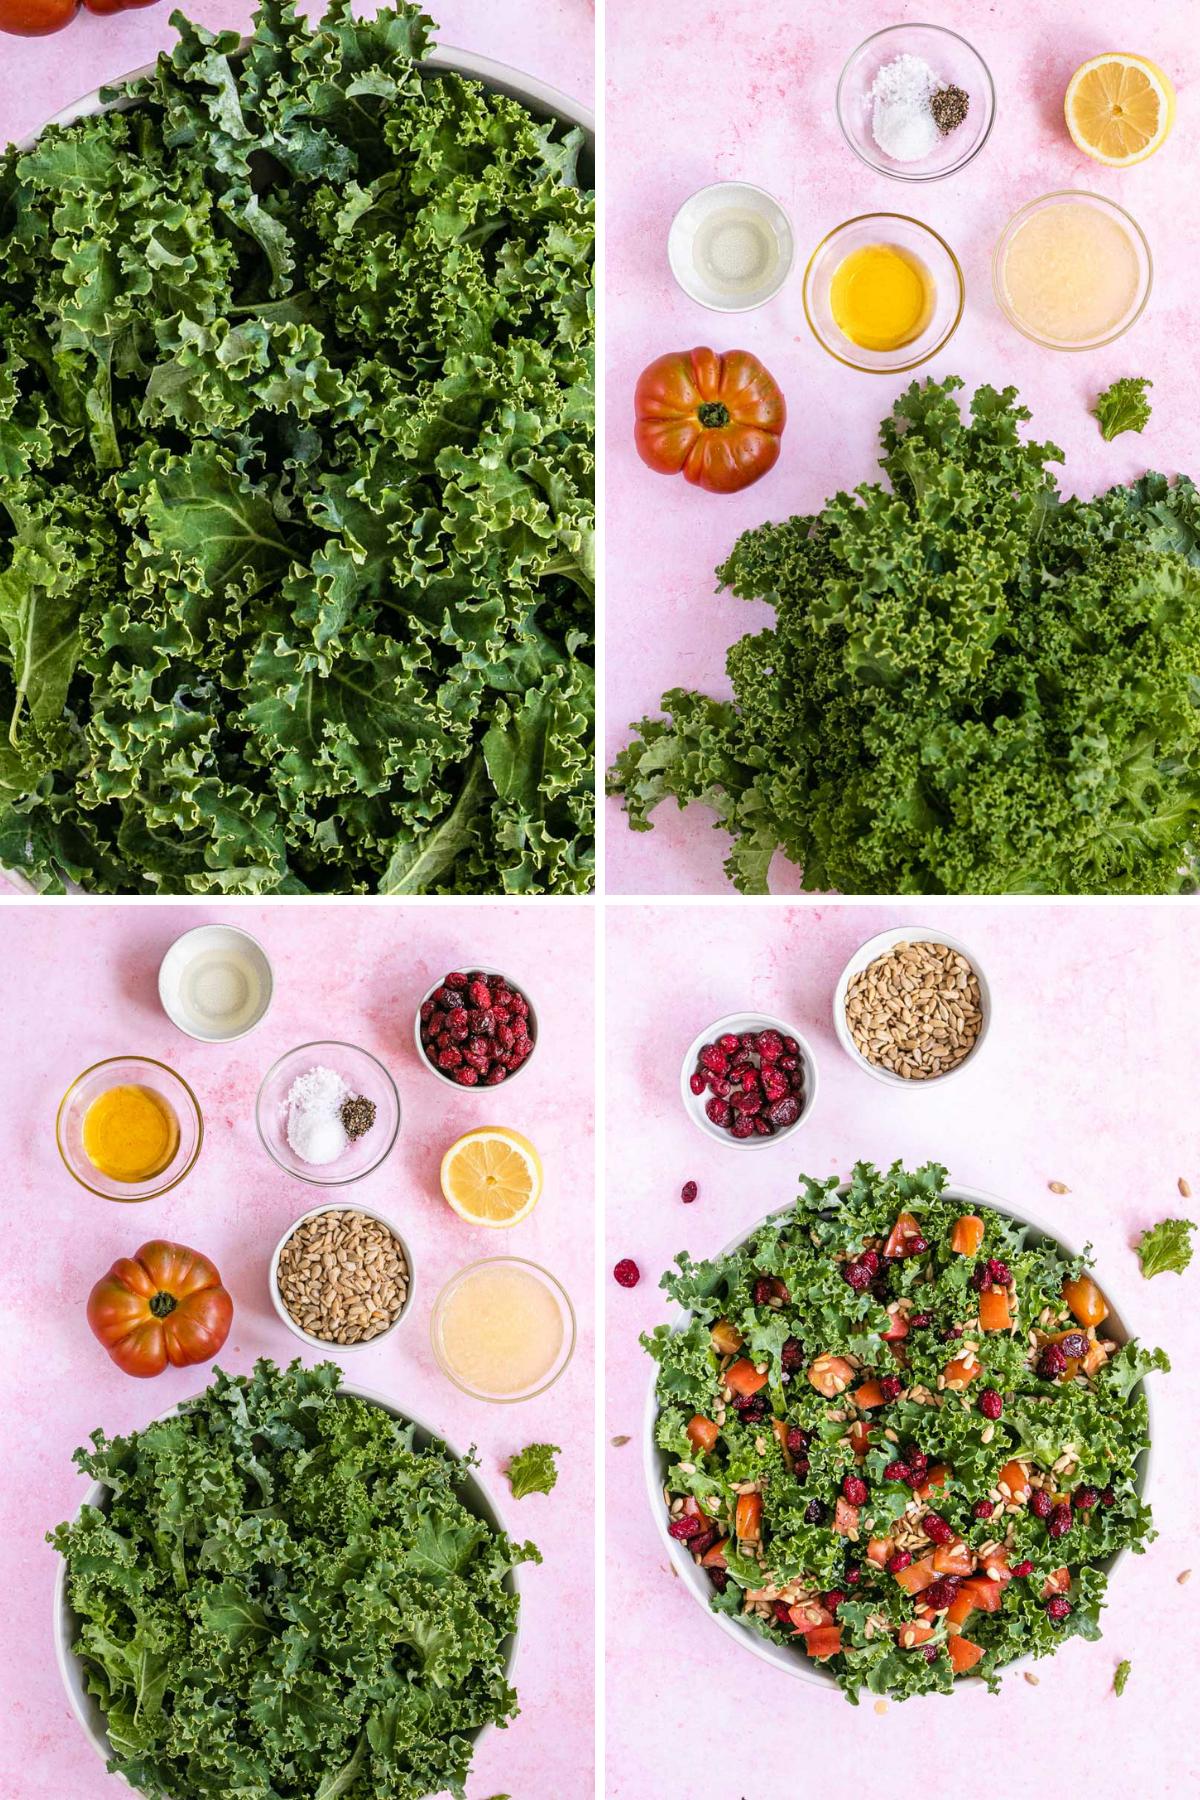 Kale Salad Collage of ingredients